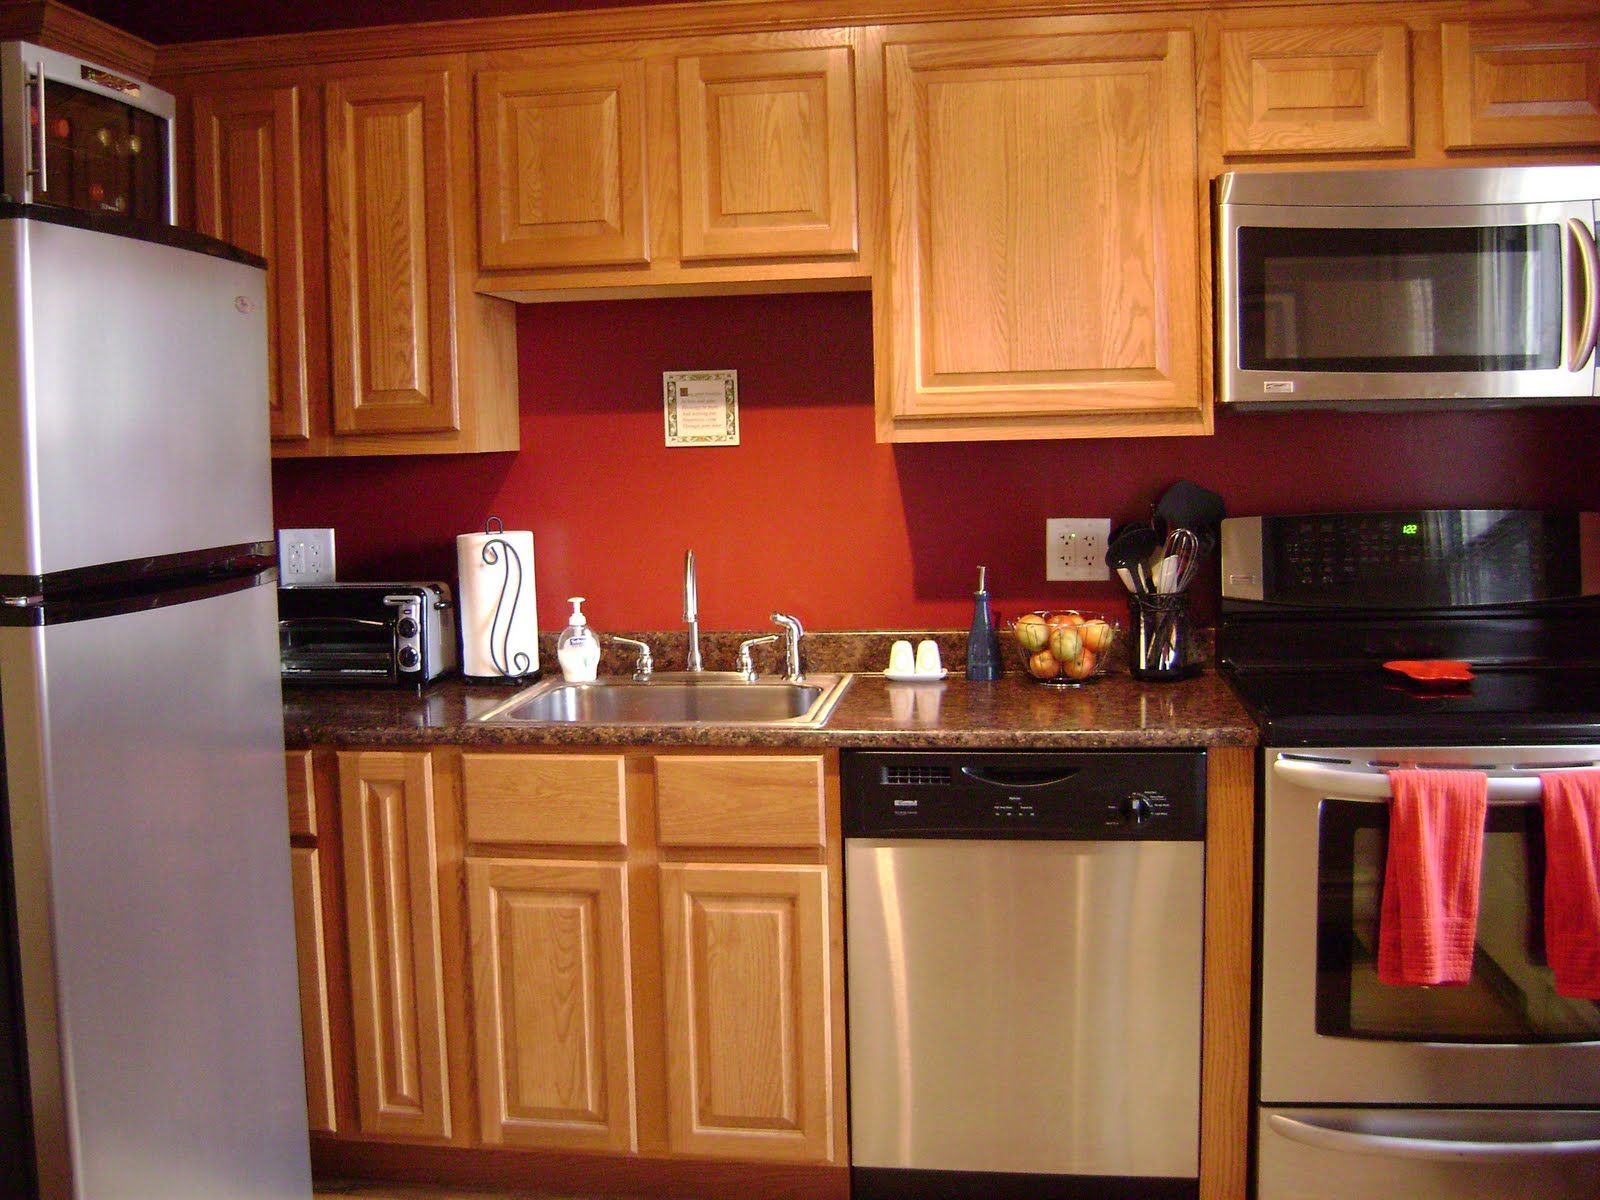 kitchen | Decorating my Fictitious Future Abode | Pinterest